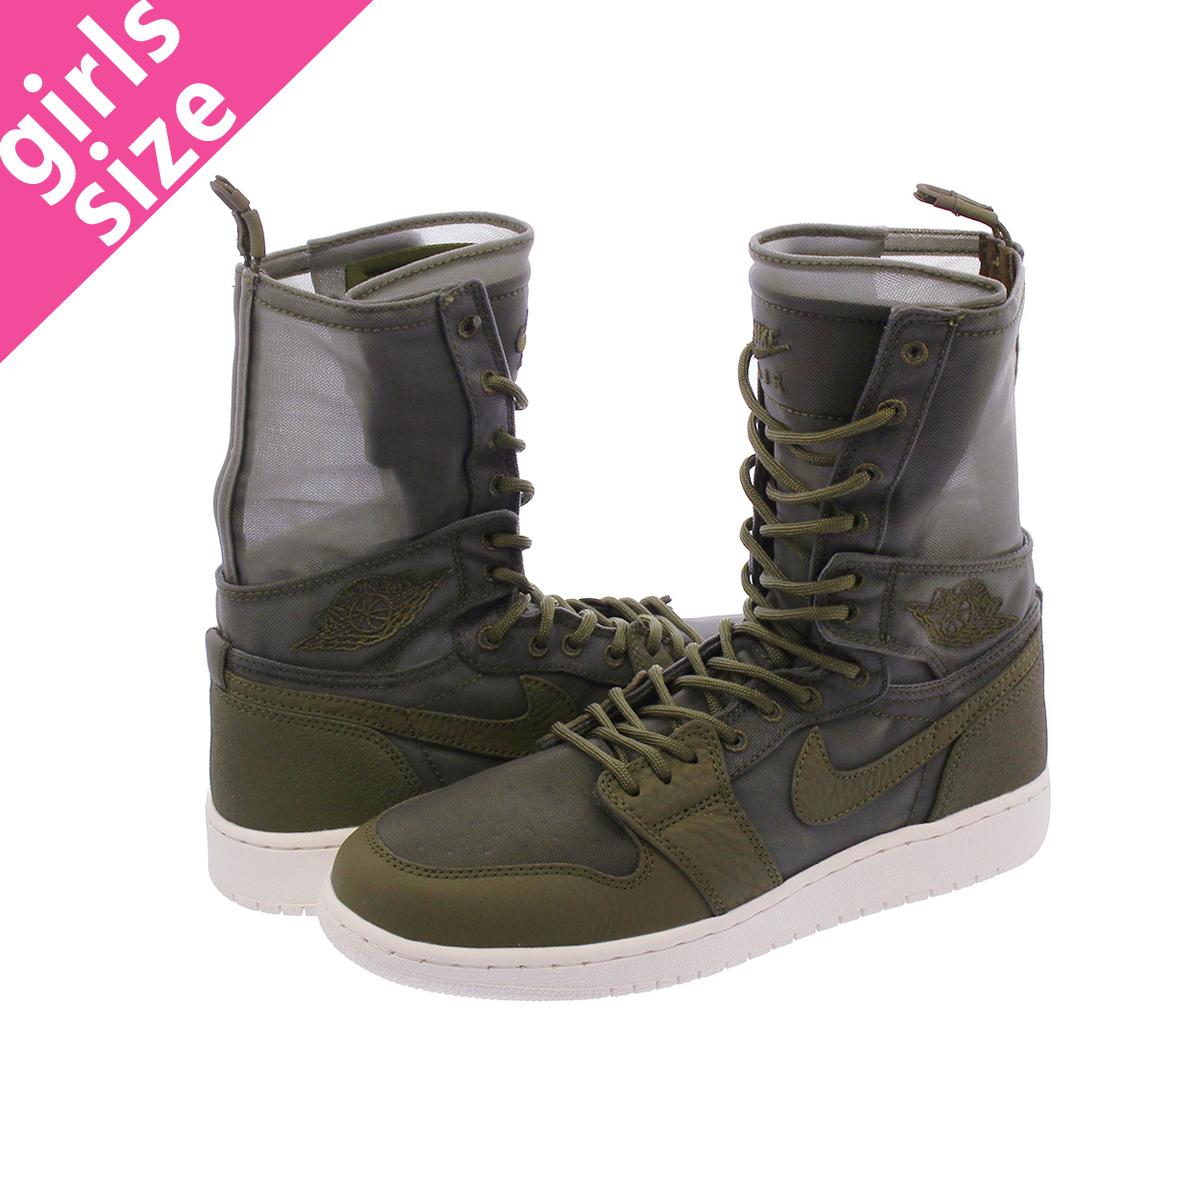 94203a050235ce NIKE WMNS AIR JORDAN EXPORER Nike women Air Jordan 1 Explorer OLIVE  CANVAS/PHANTOM aq7883 ...